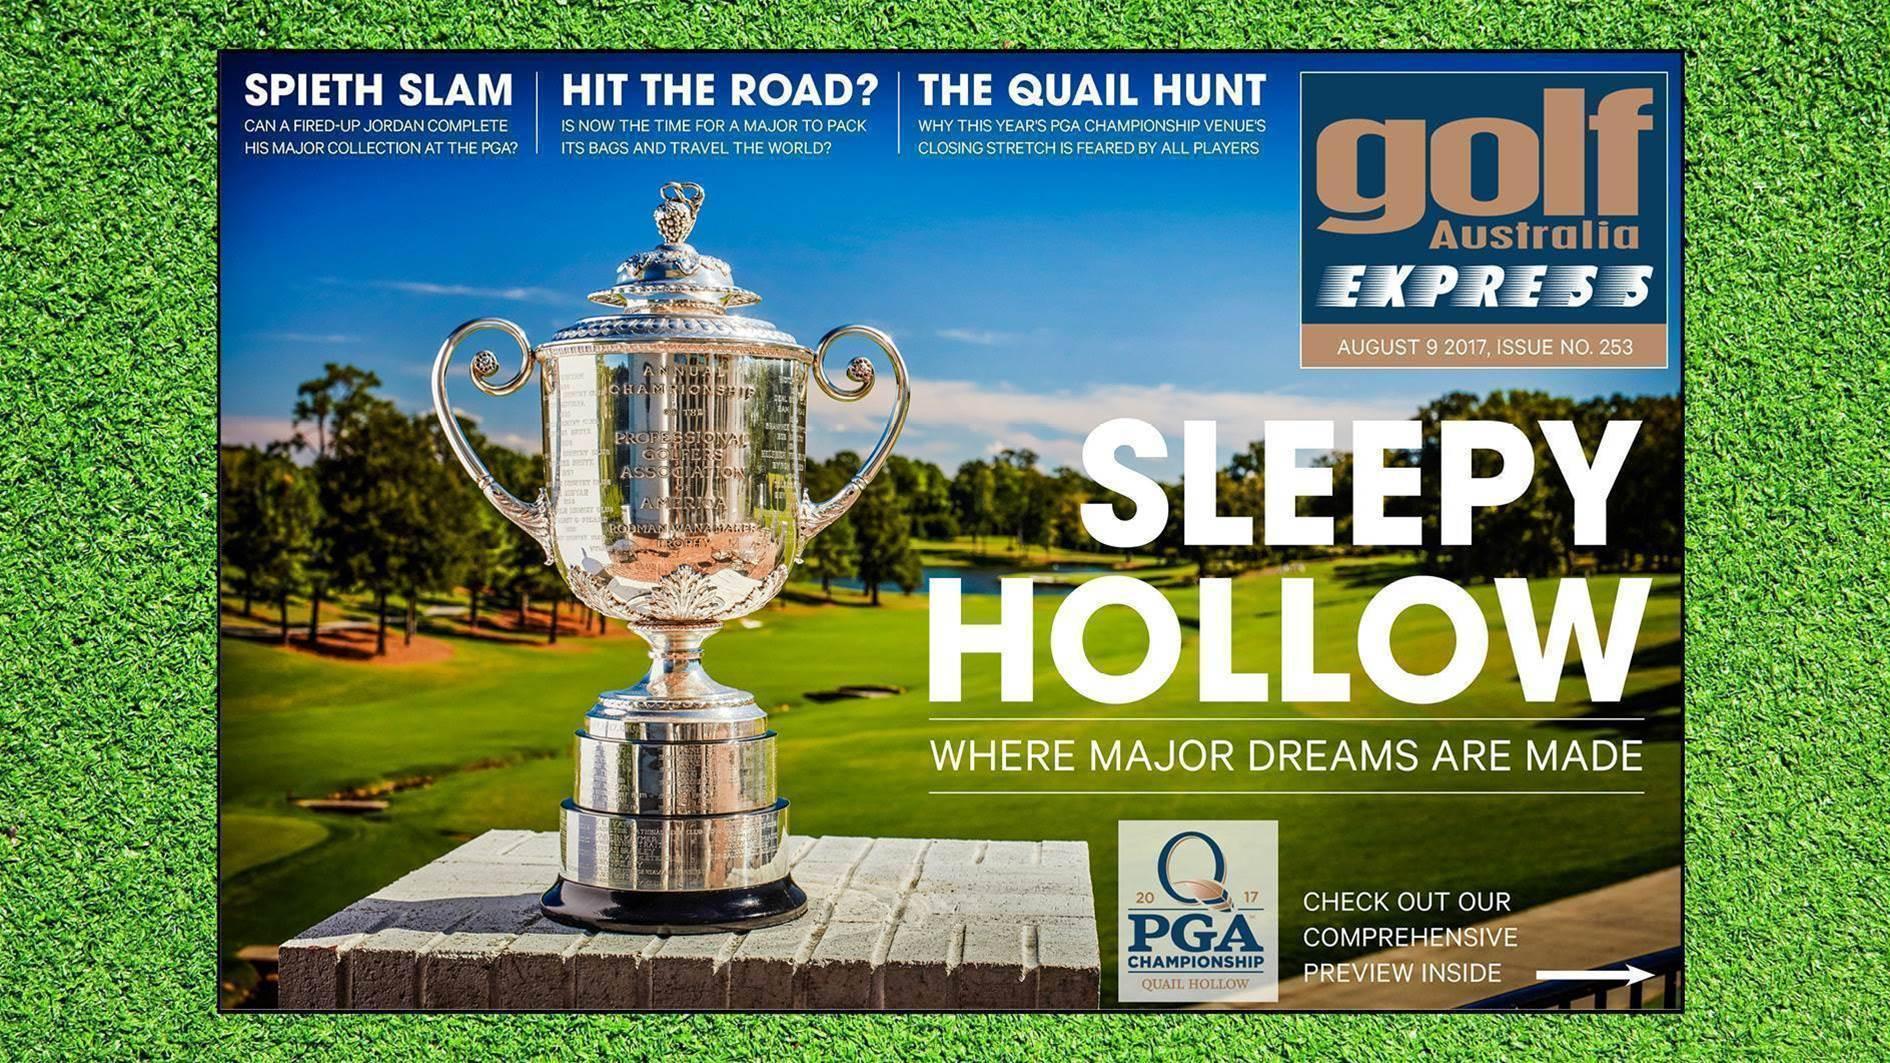 GA Express #253: PGA Championship preview